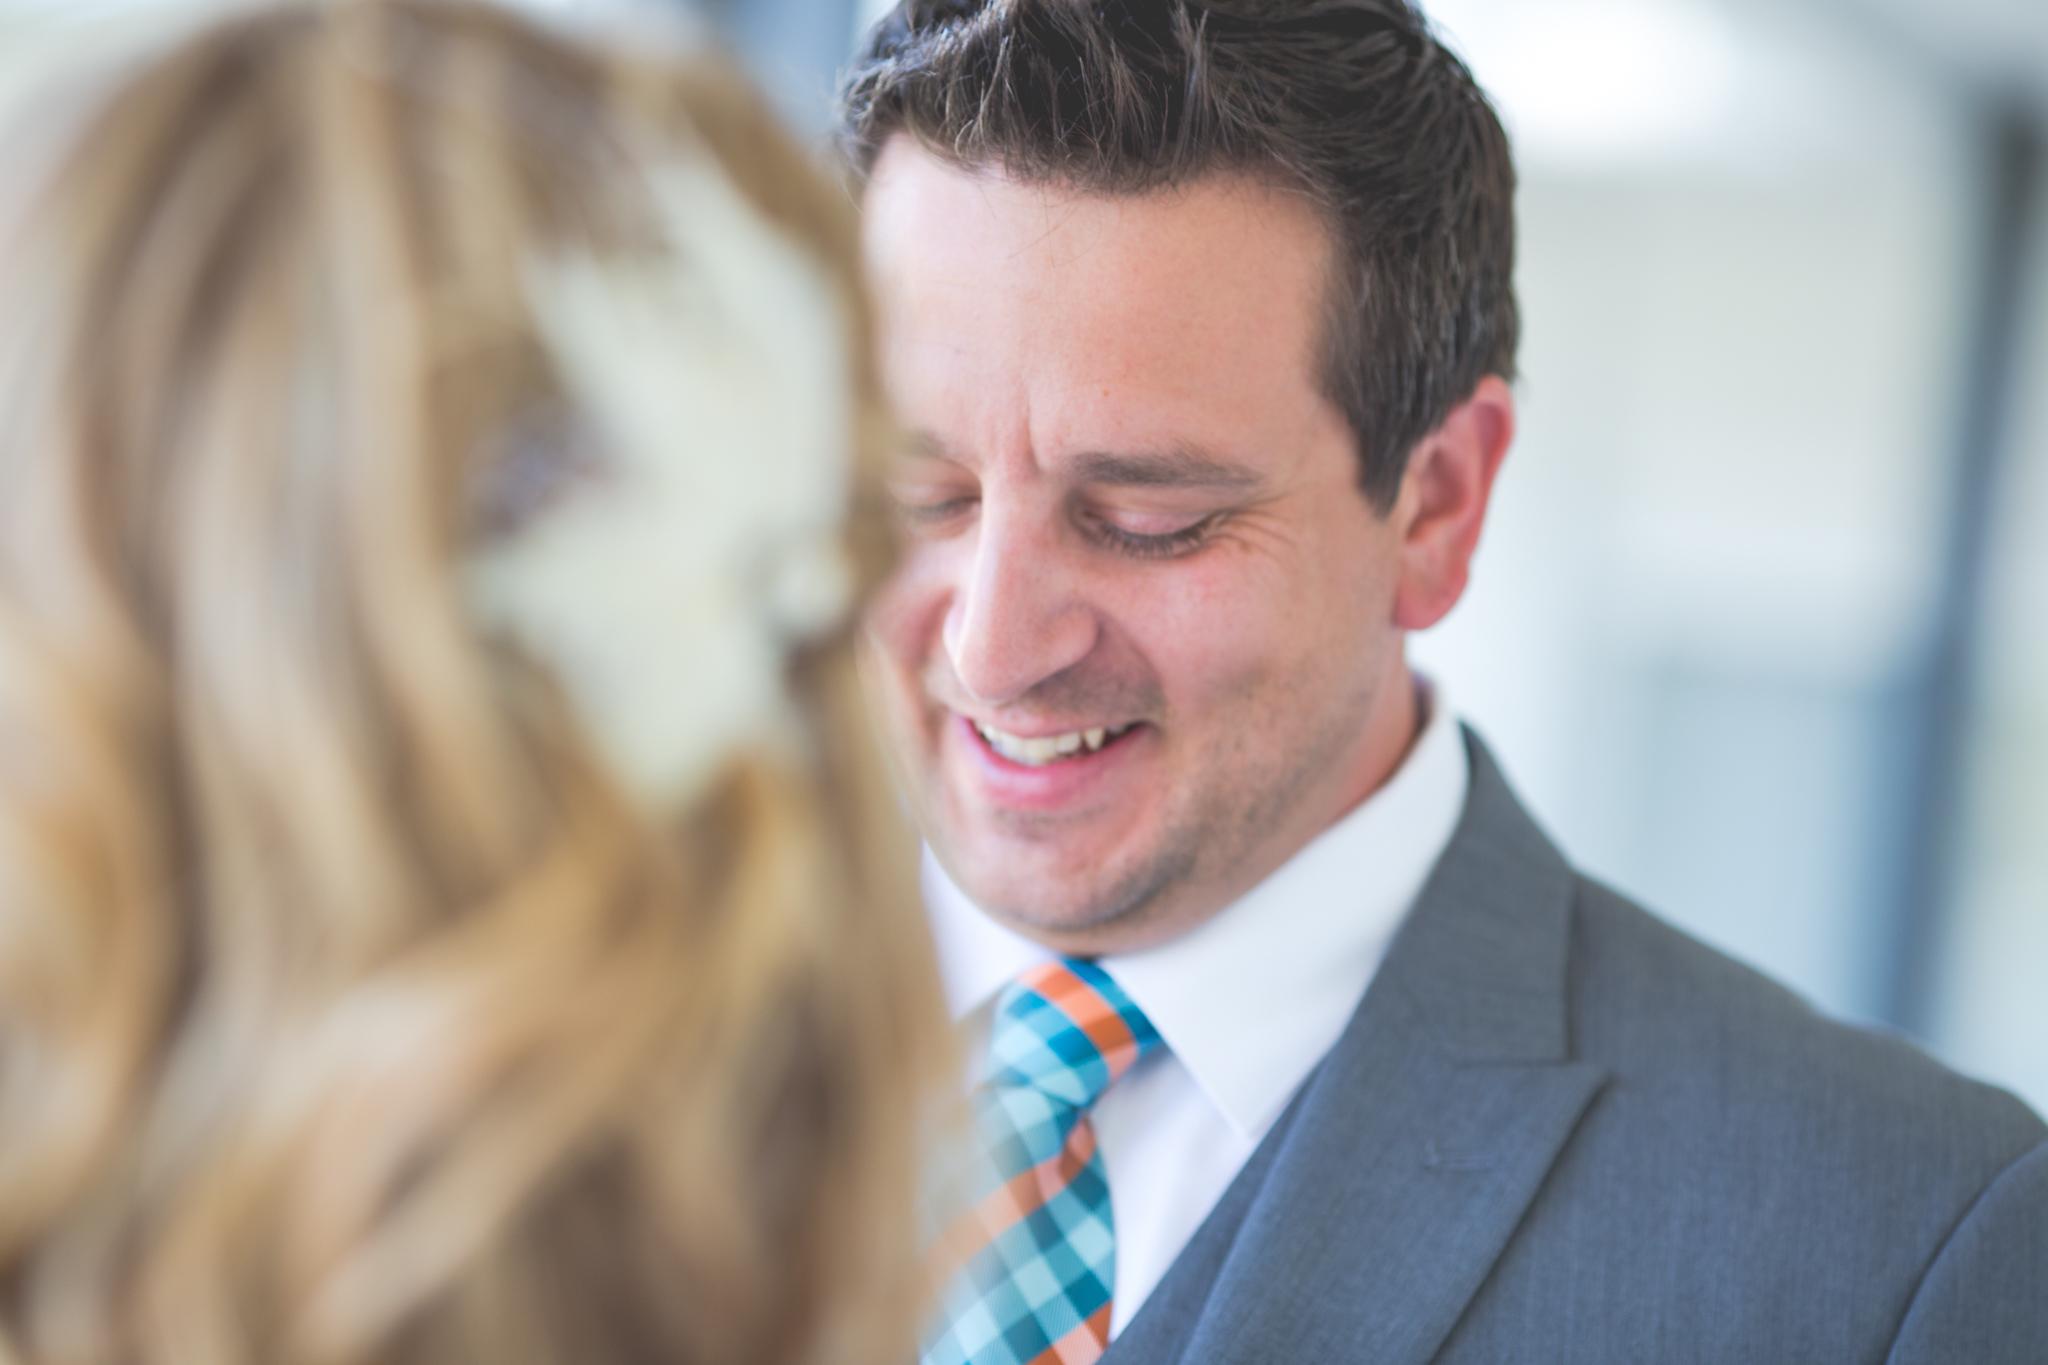 scottsdale-wedding-photographer-el-dorado-ben-smile-first-look